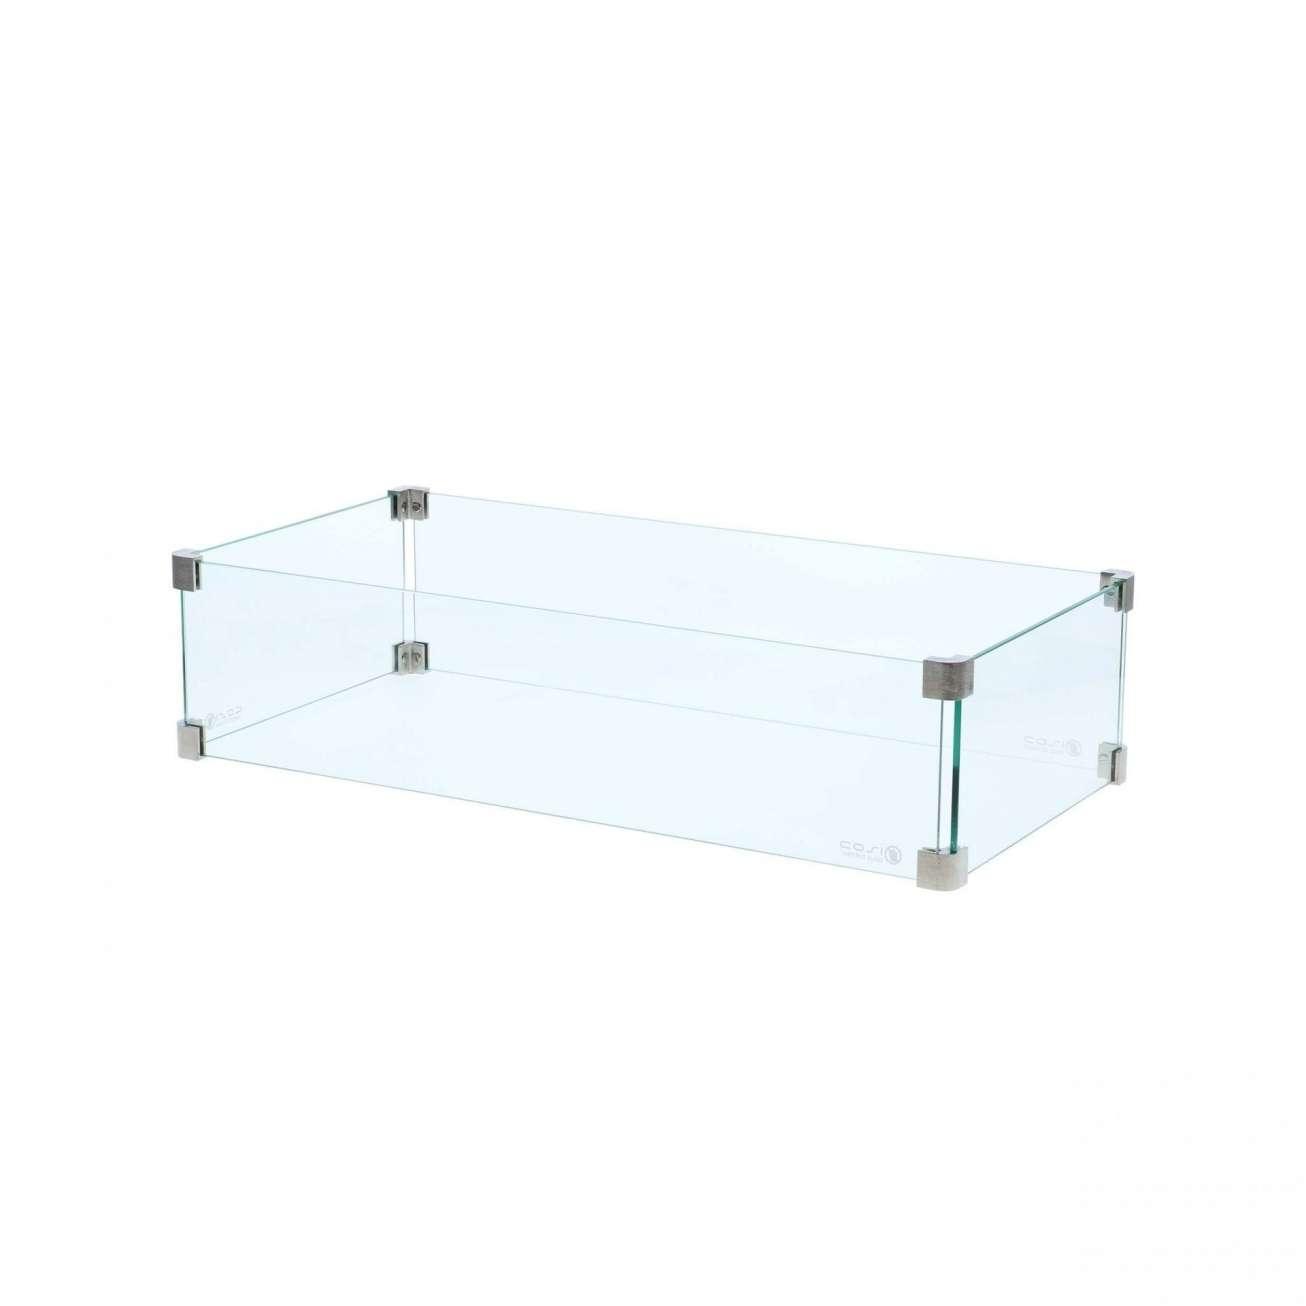 Cosi Glass Til Gasspeis Rektangulært